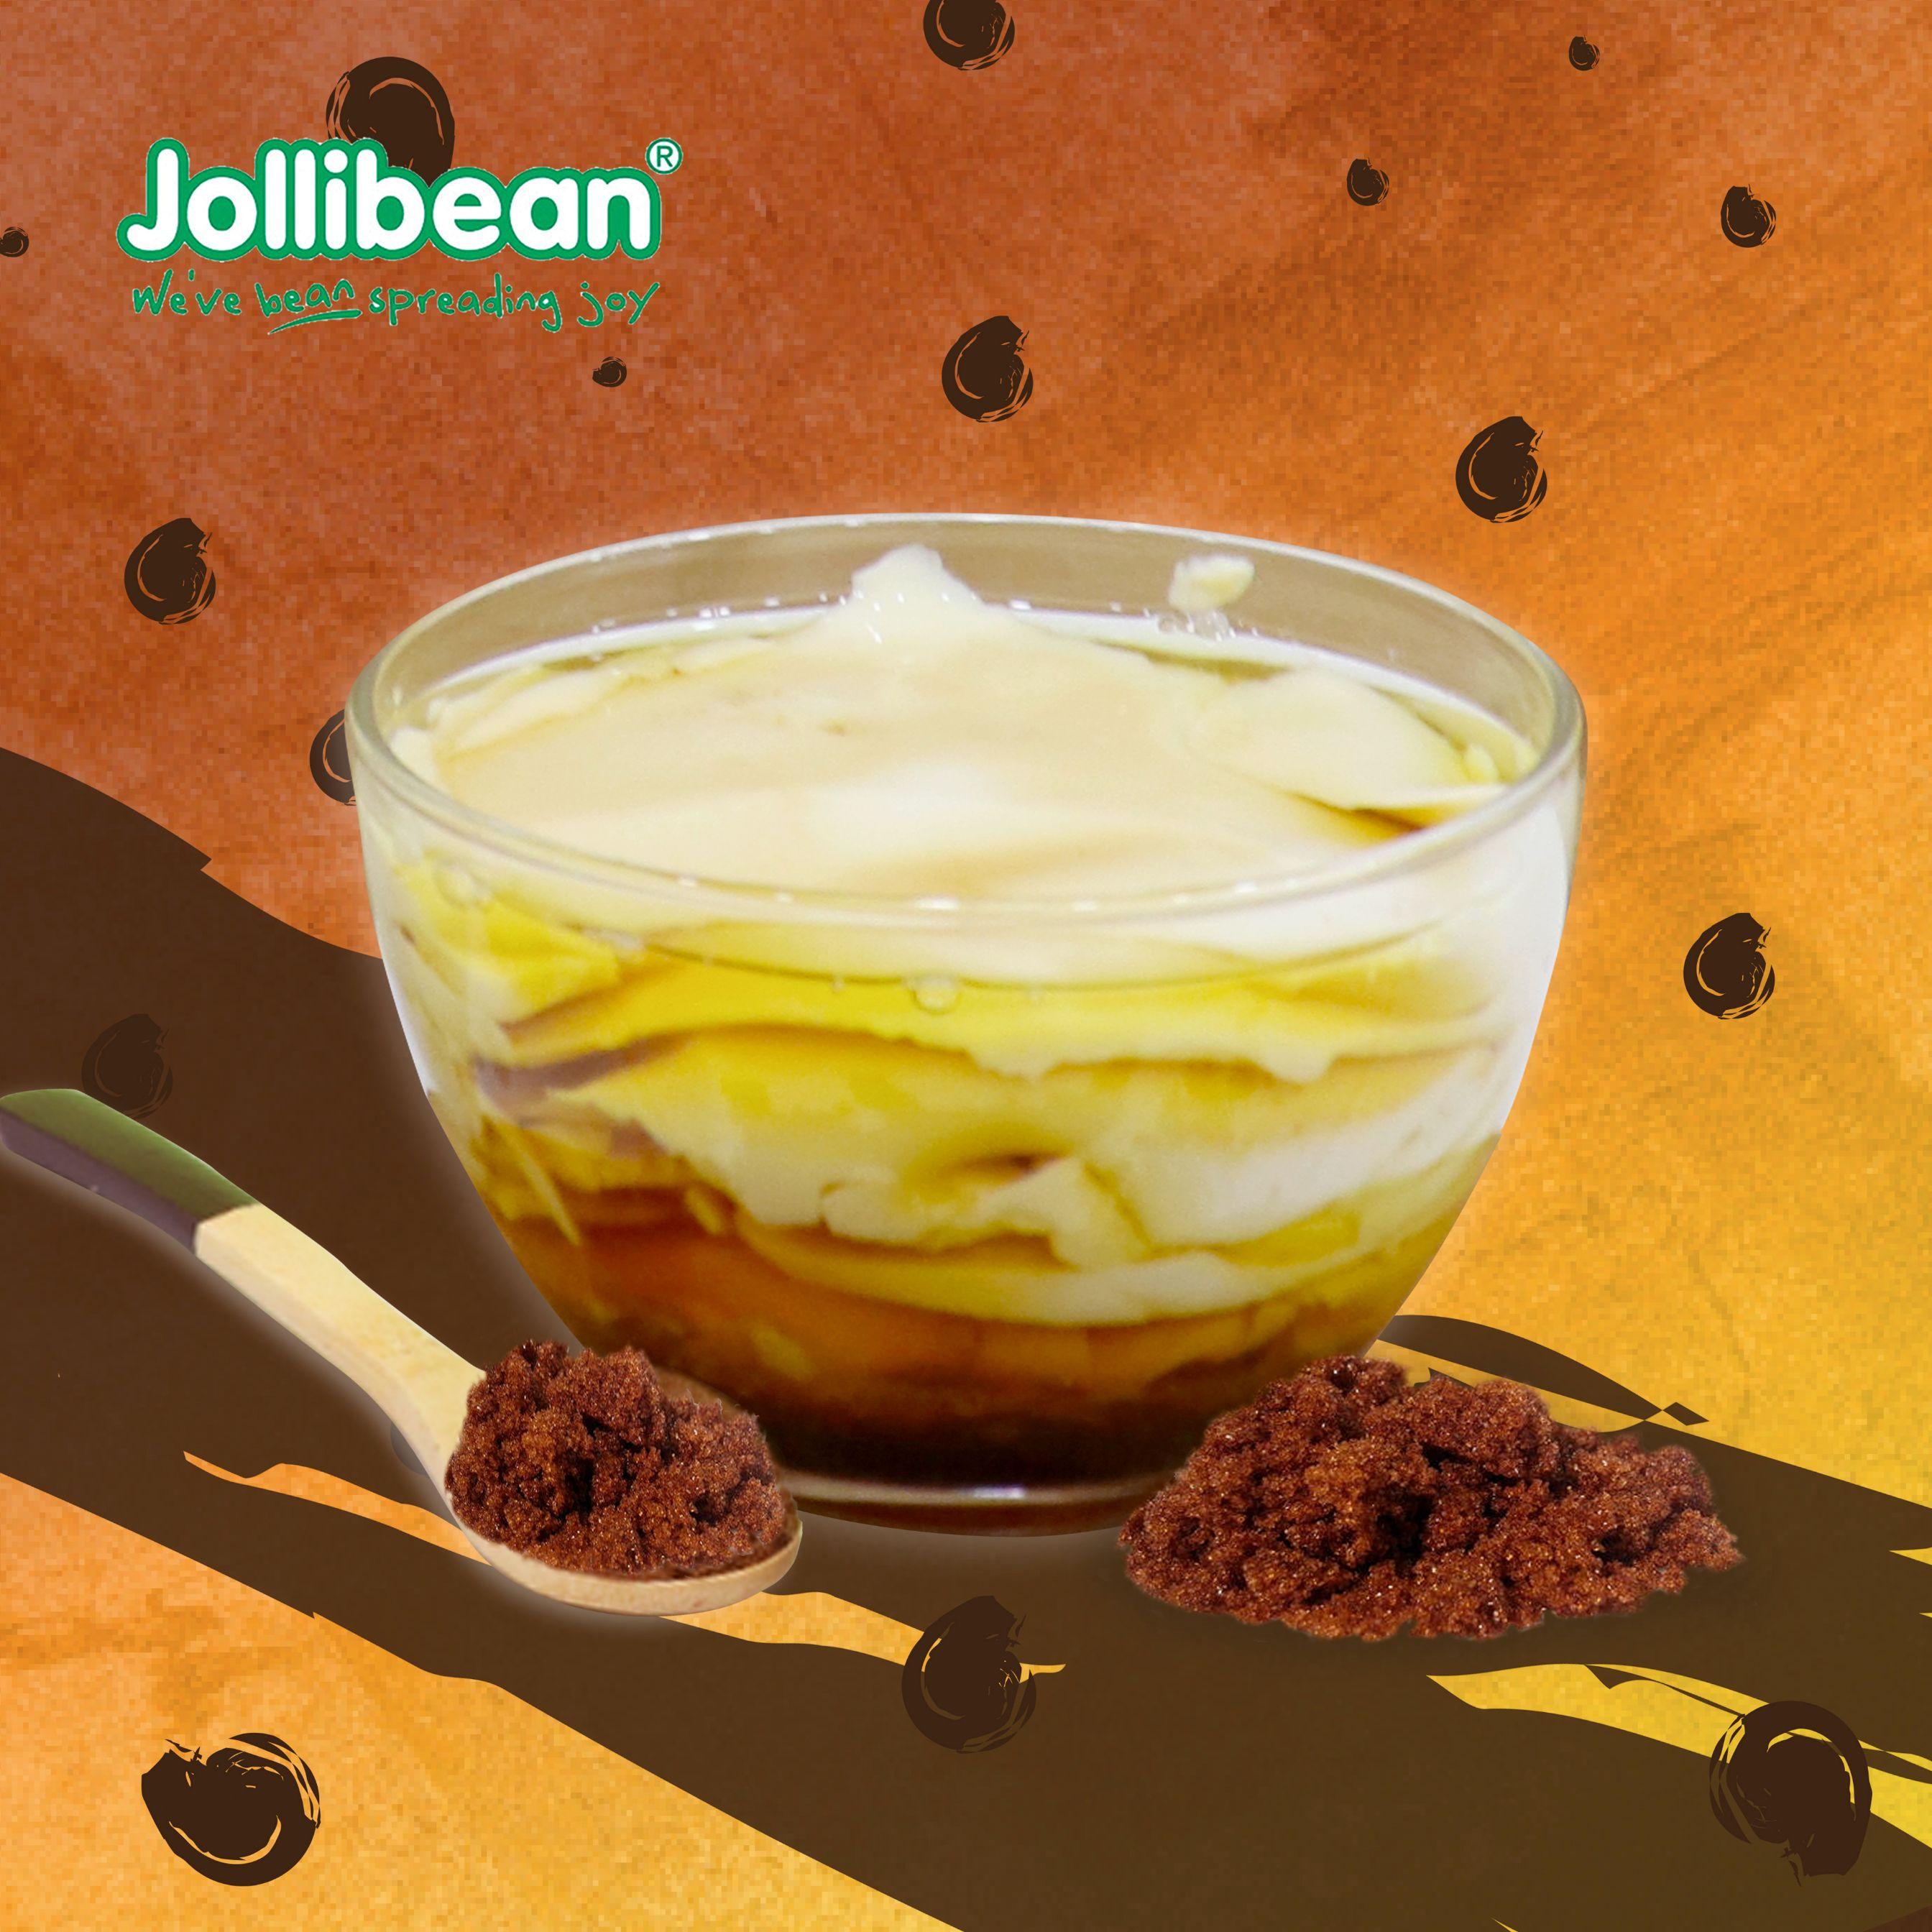 1 x Jollibean Brown Sugar Beancurd [Limited Stock]